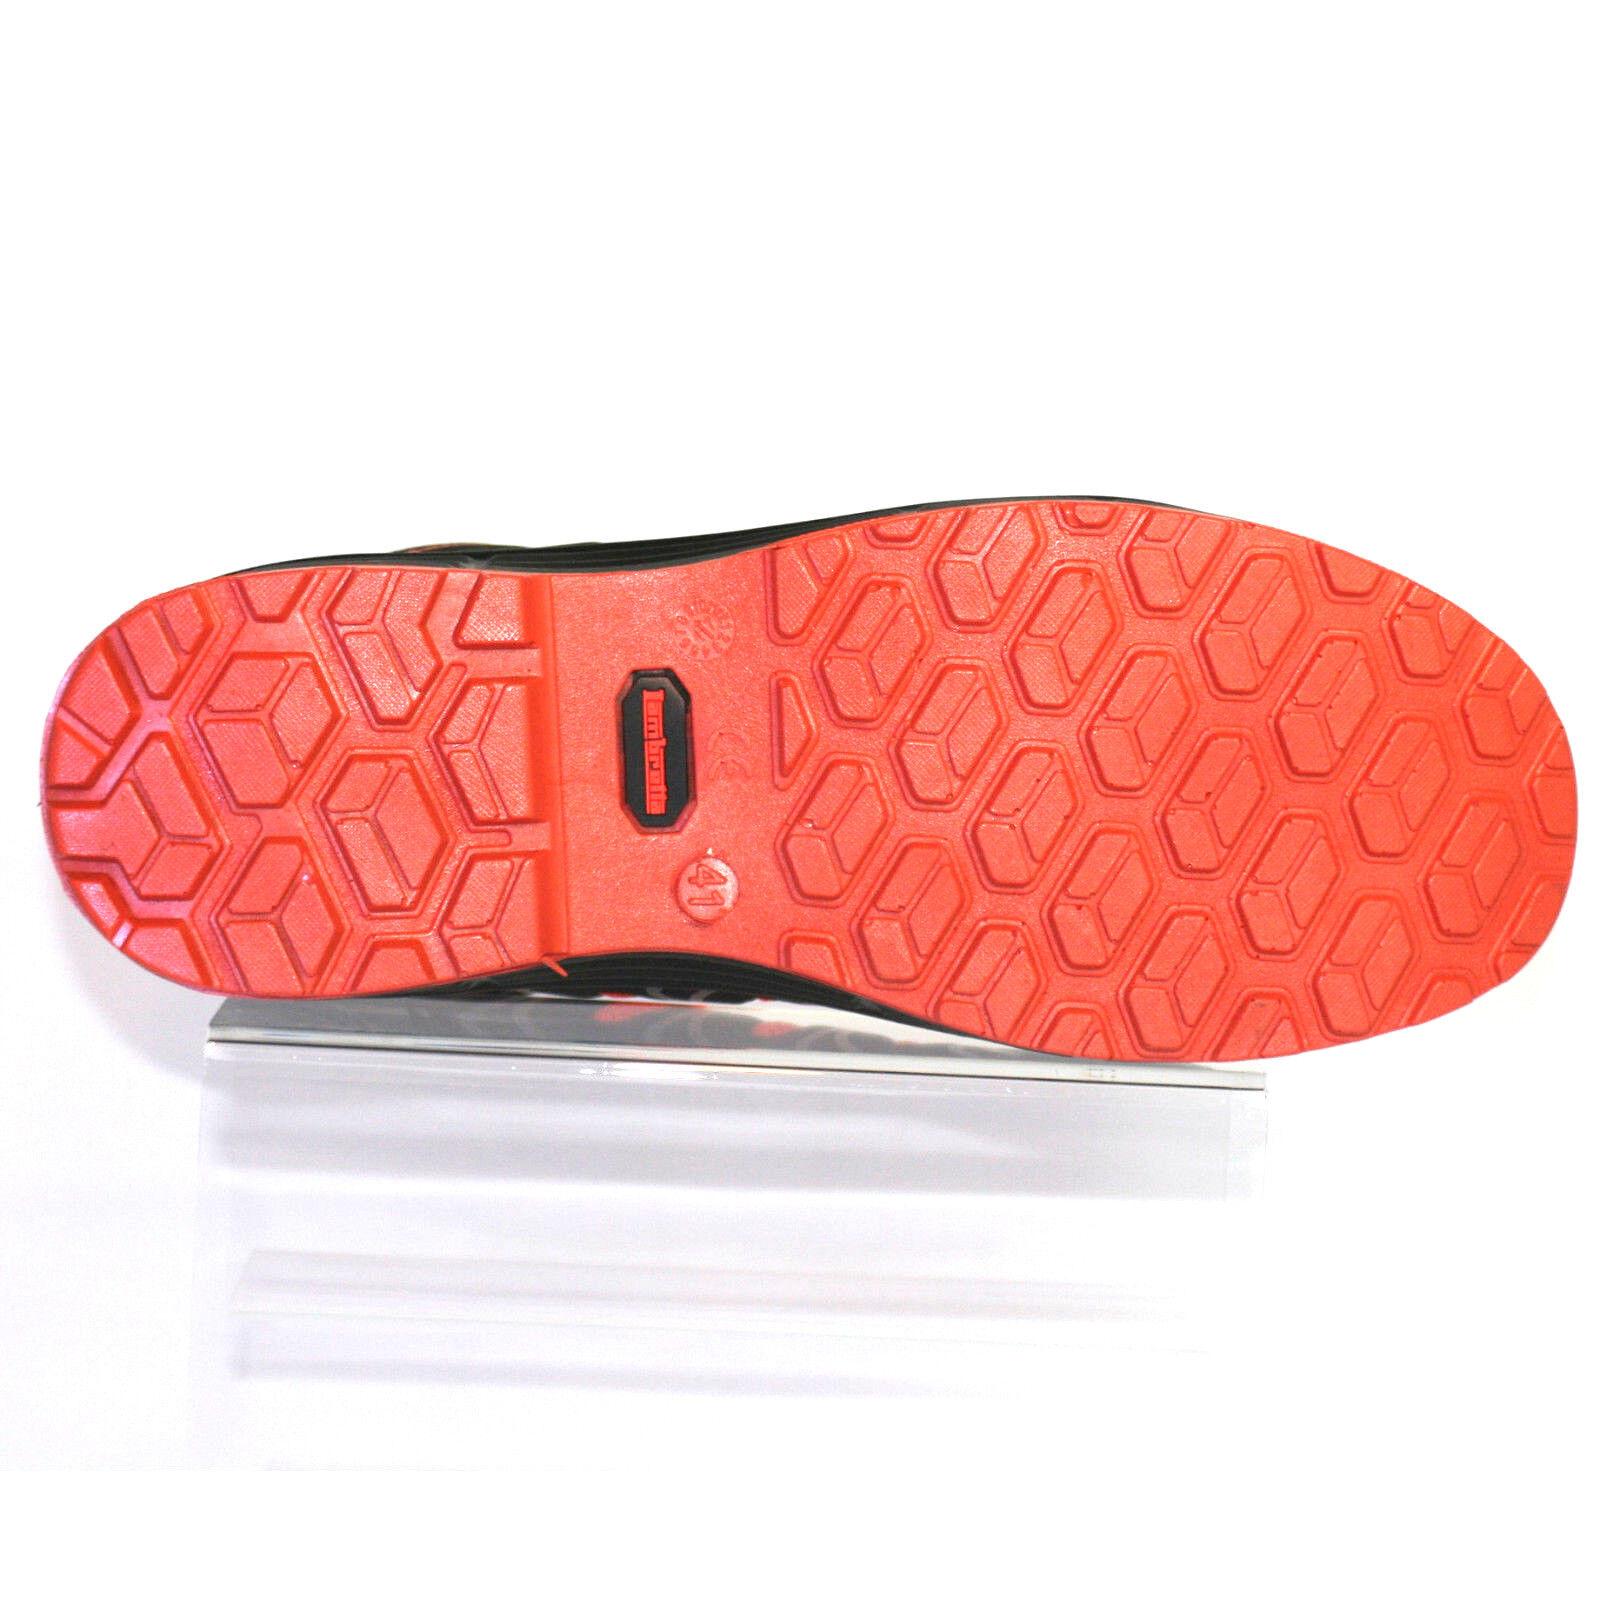 adidas Copa 17.1 Firm Ground Chaussures Chaussures Ground de Football Jaune/Legend Ink/Semi Jaune 218ccf